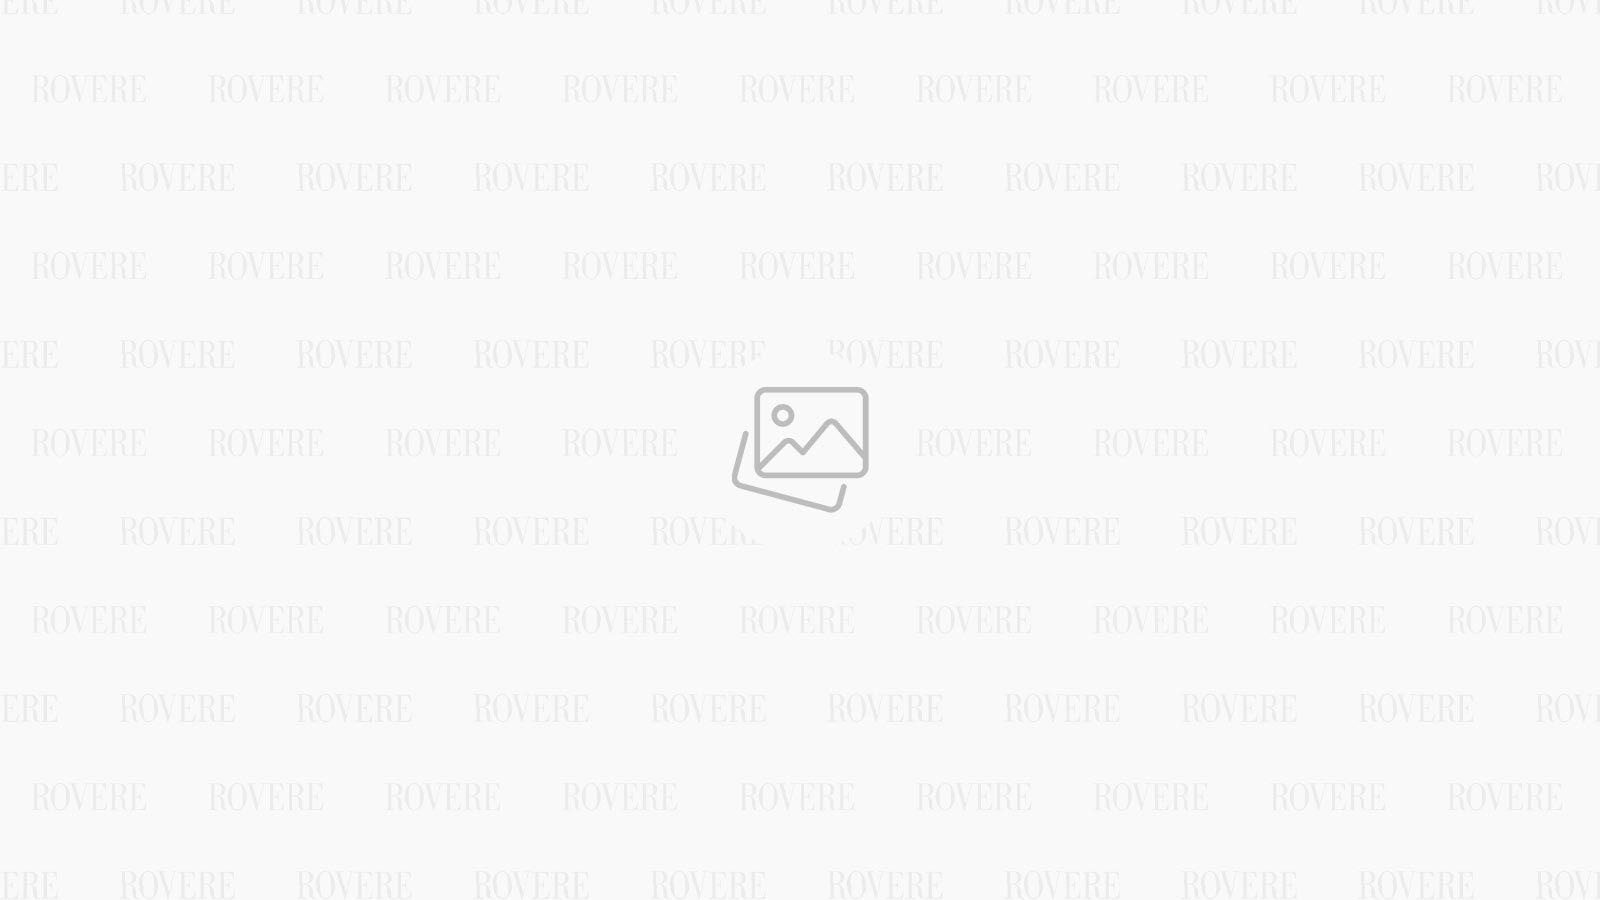 Canapea de colt cu sezlong Calini piele Cerato Black Vintage, dreapta